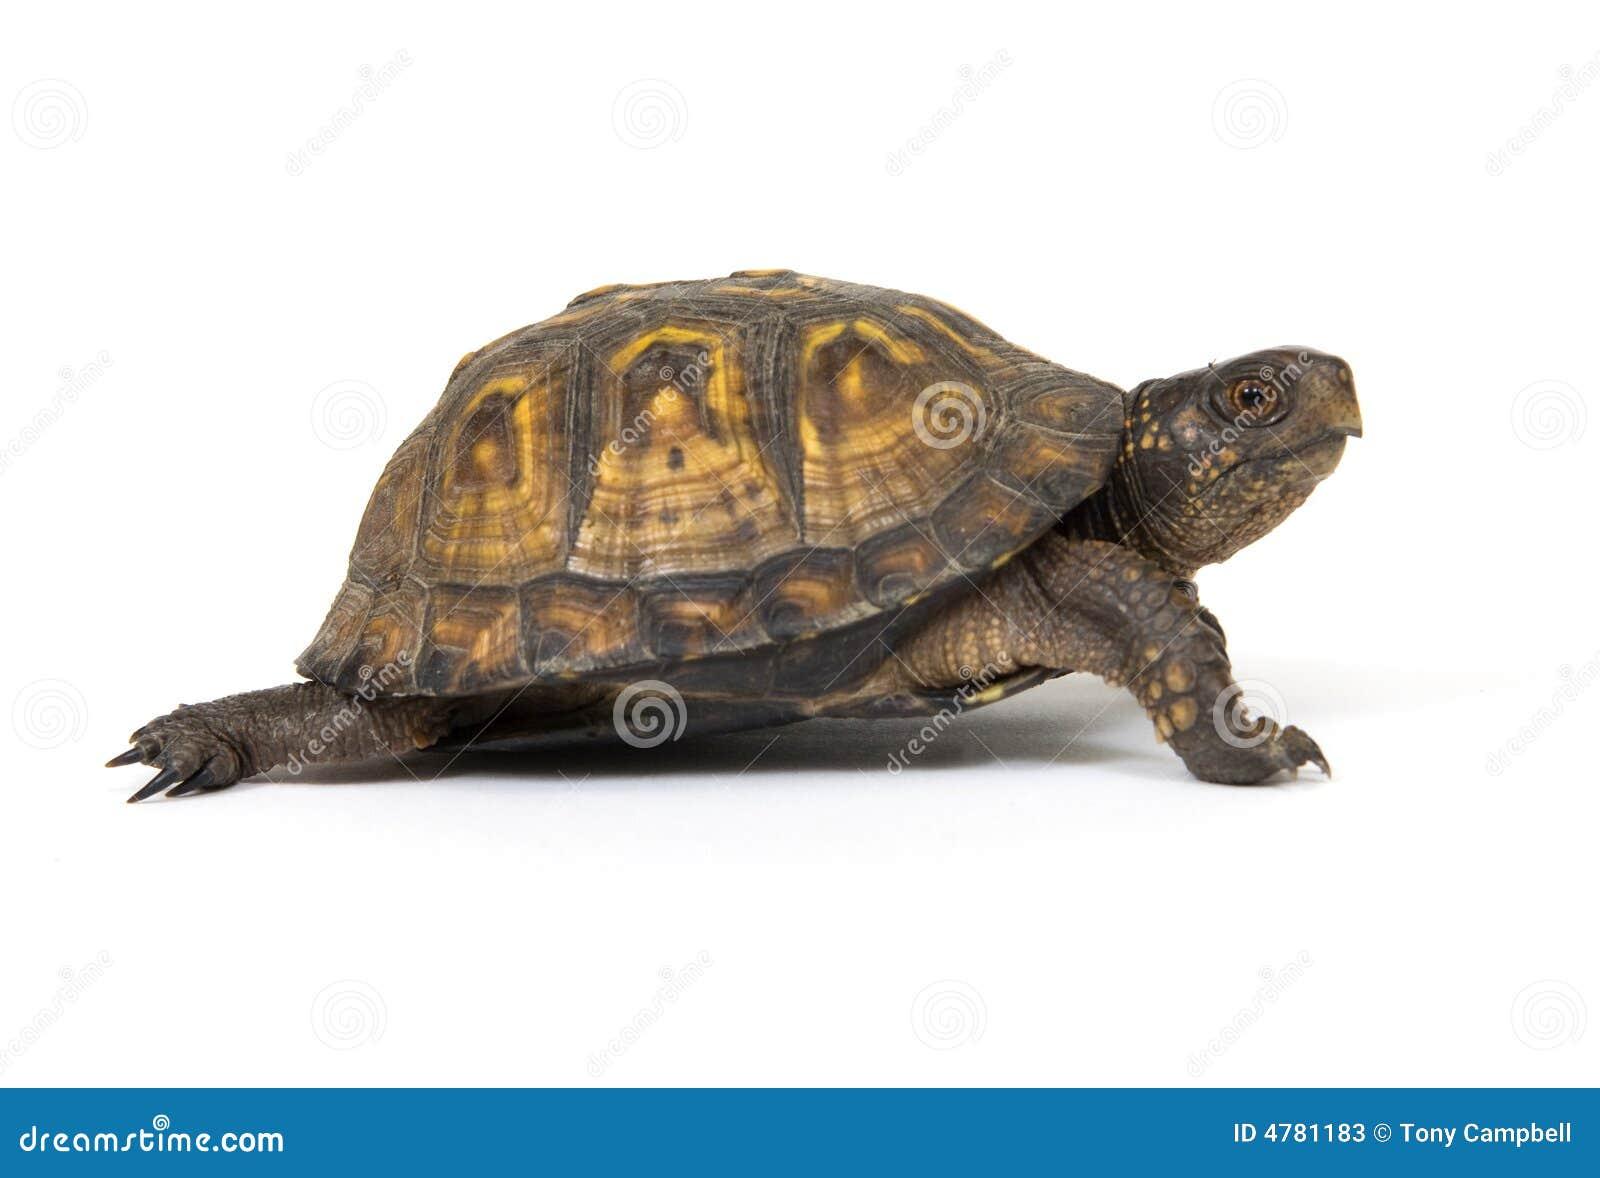 box turtle on a white background stock photos image 4781183